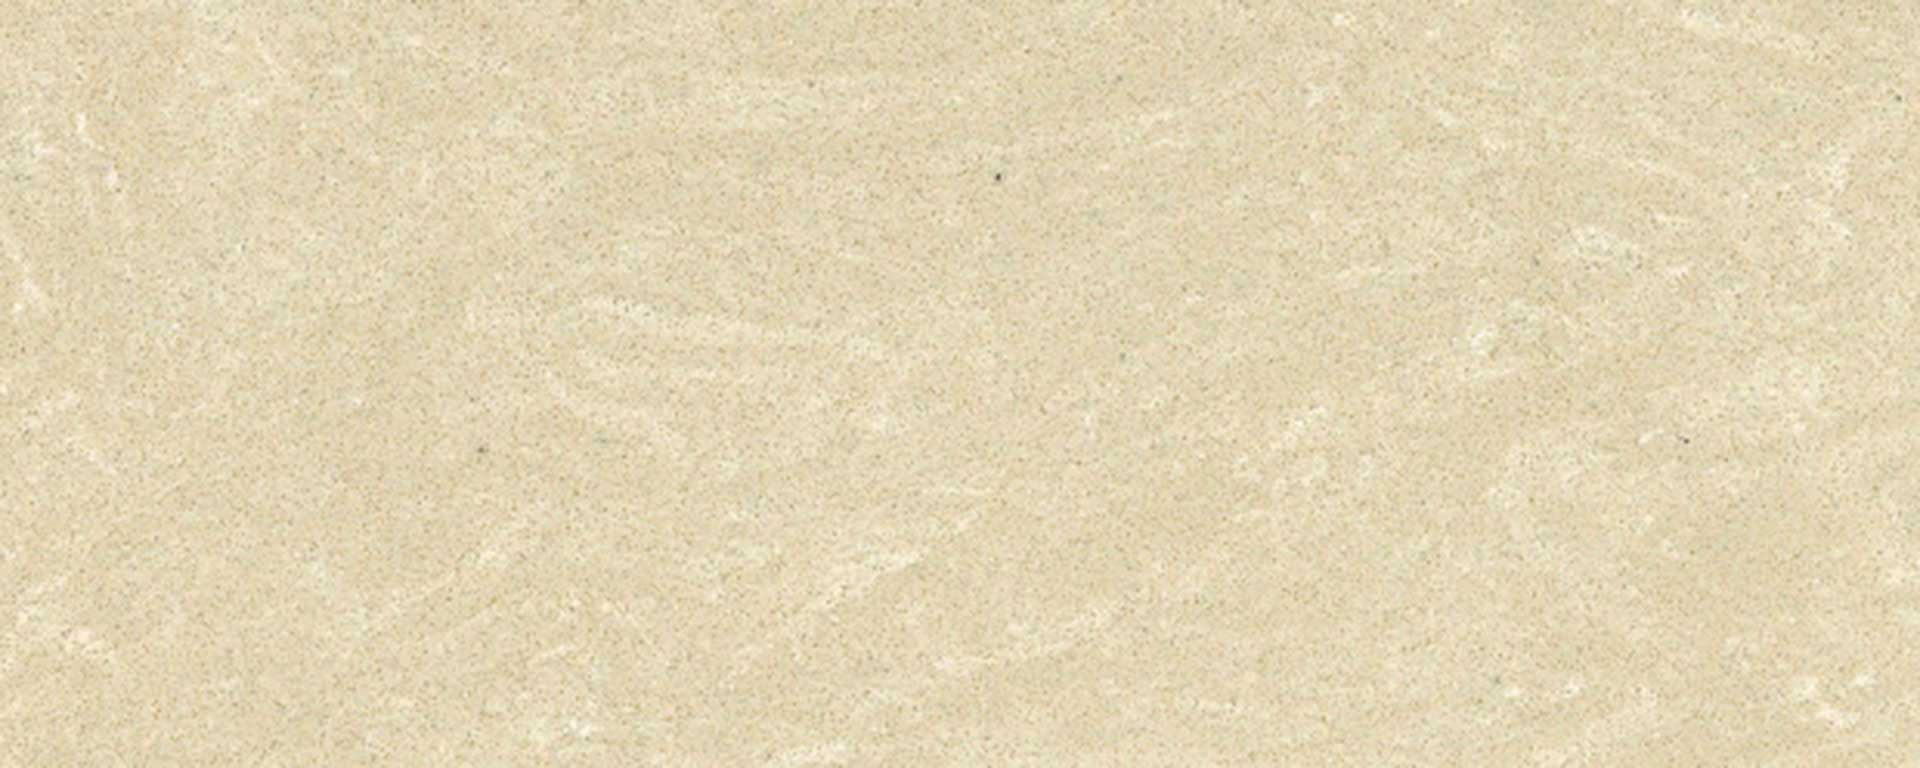 MMDR-010-terrazzo-marmo-resina-